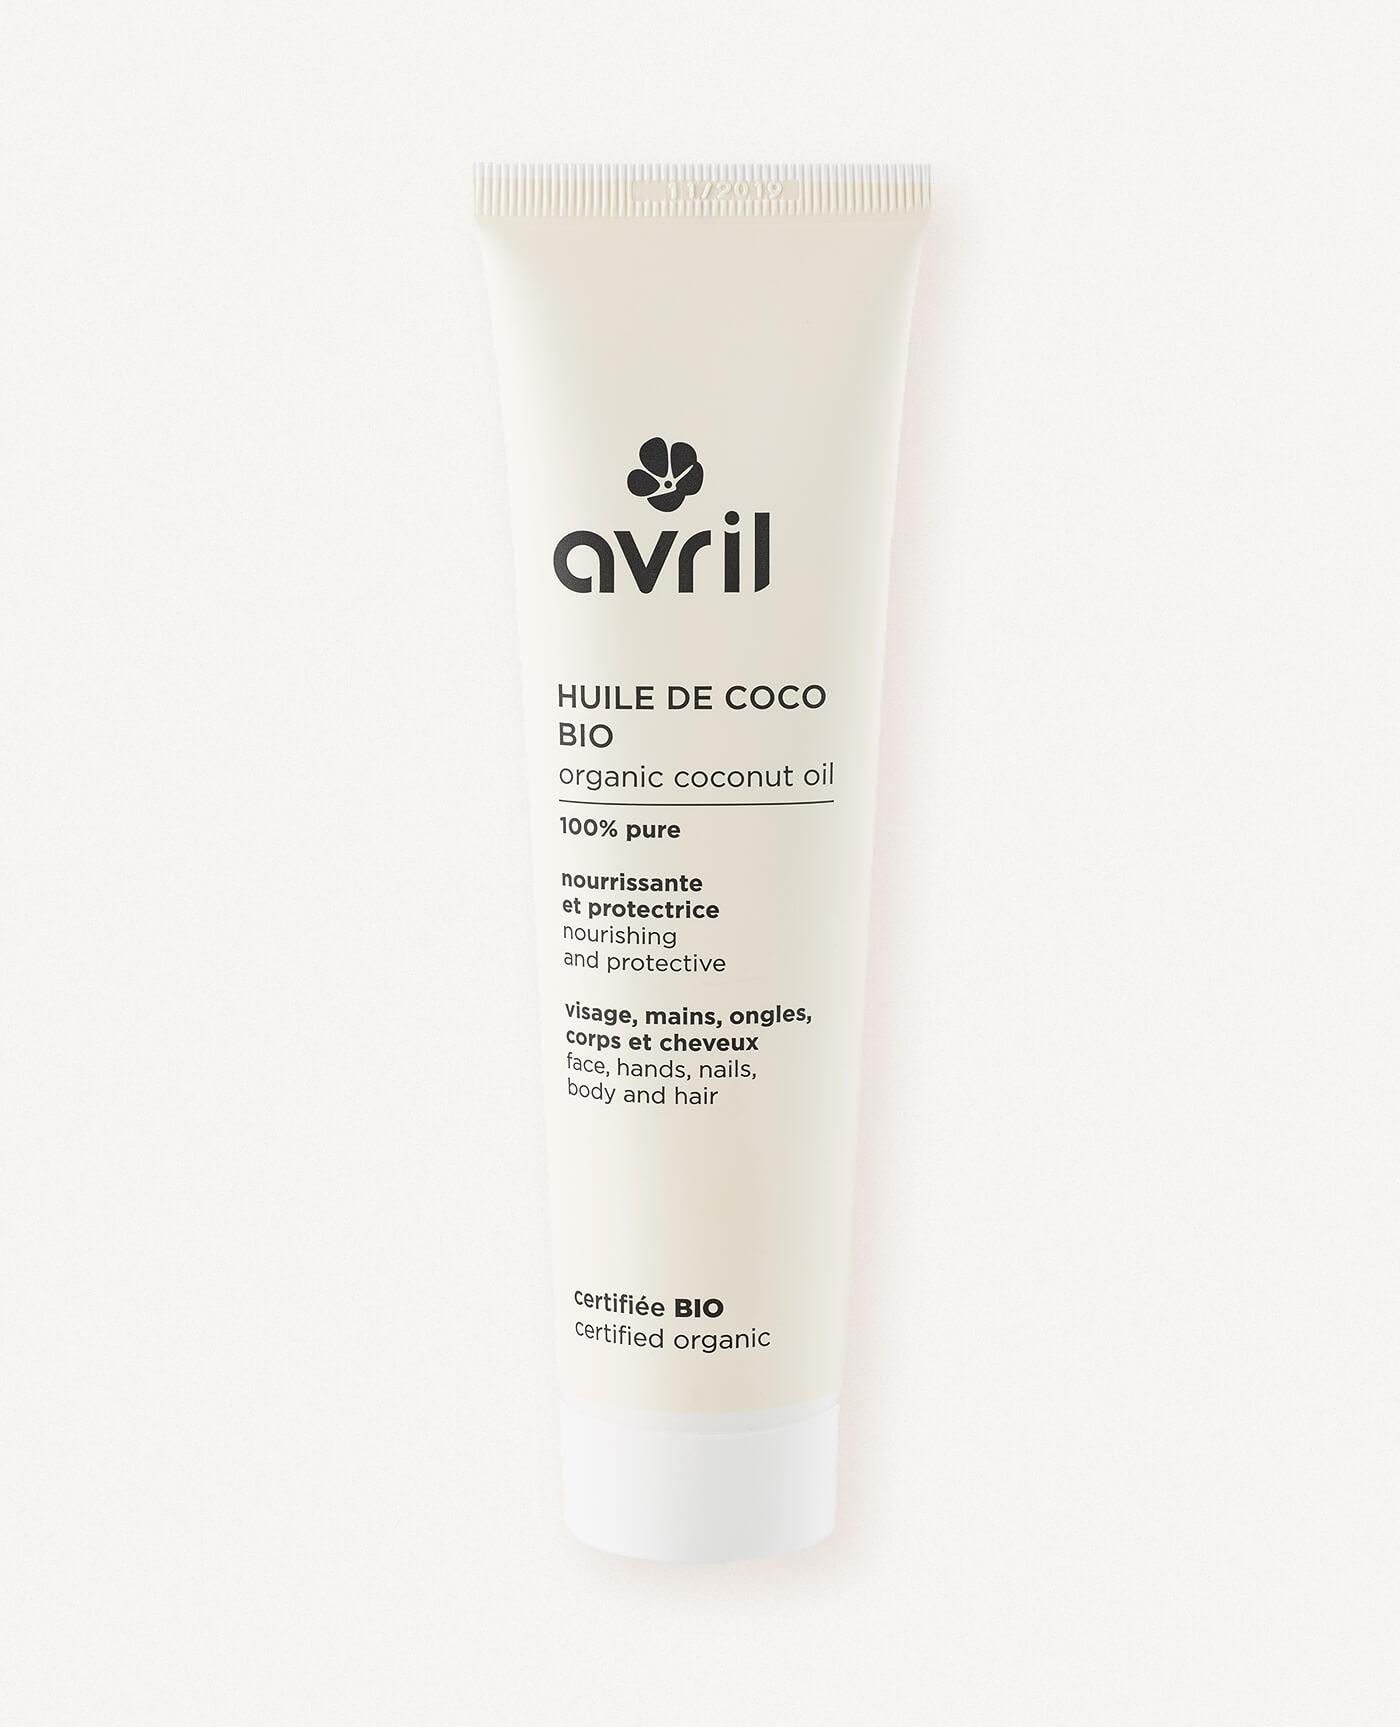 Huile de coco bio, naturel et vegan de la marque Avril cosmétiques made in France